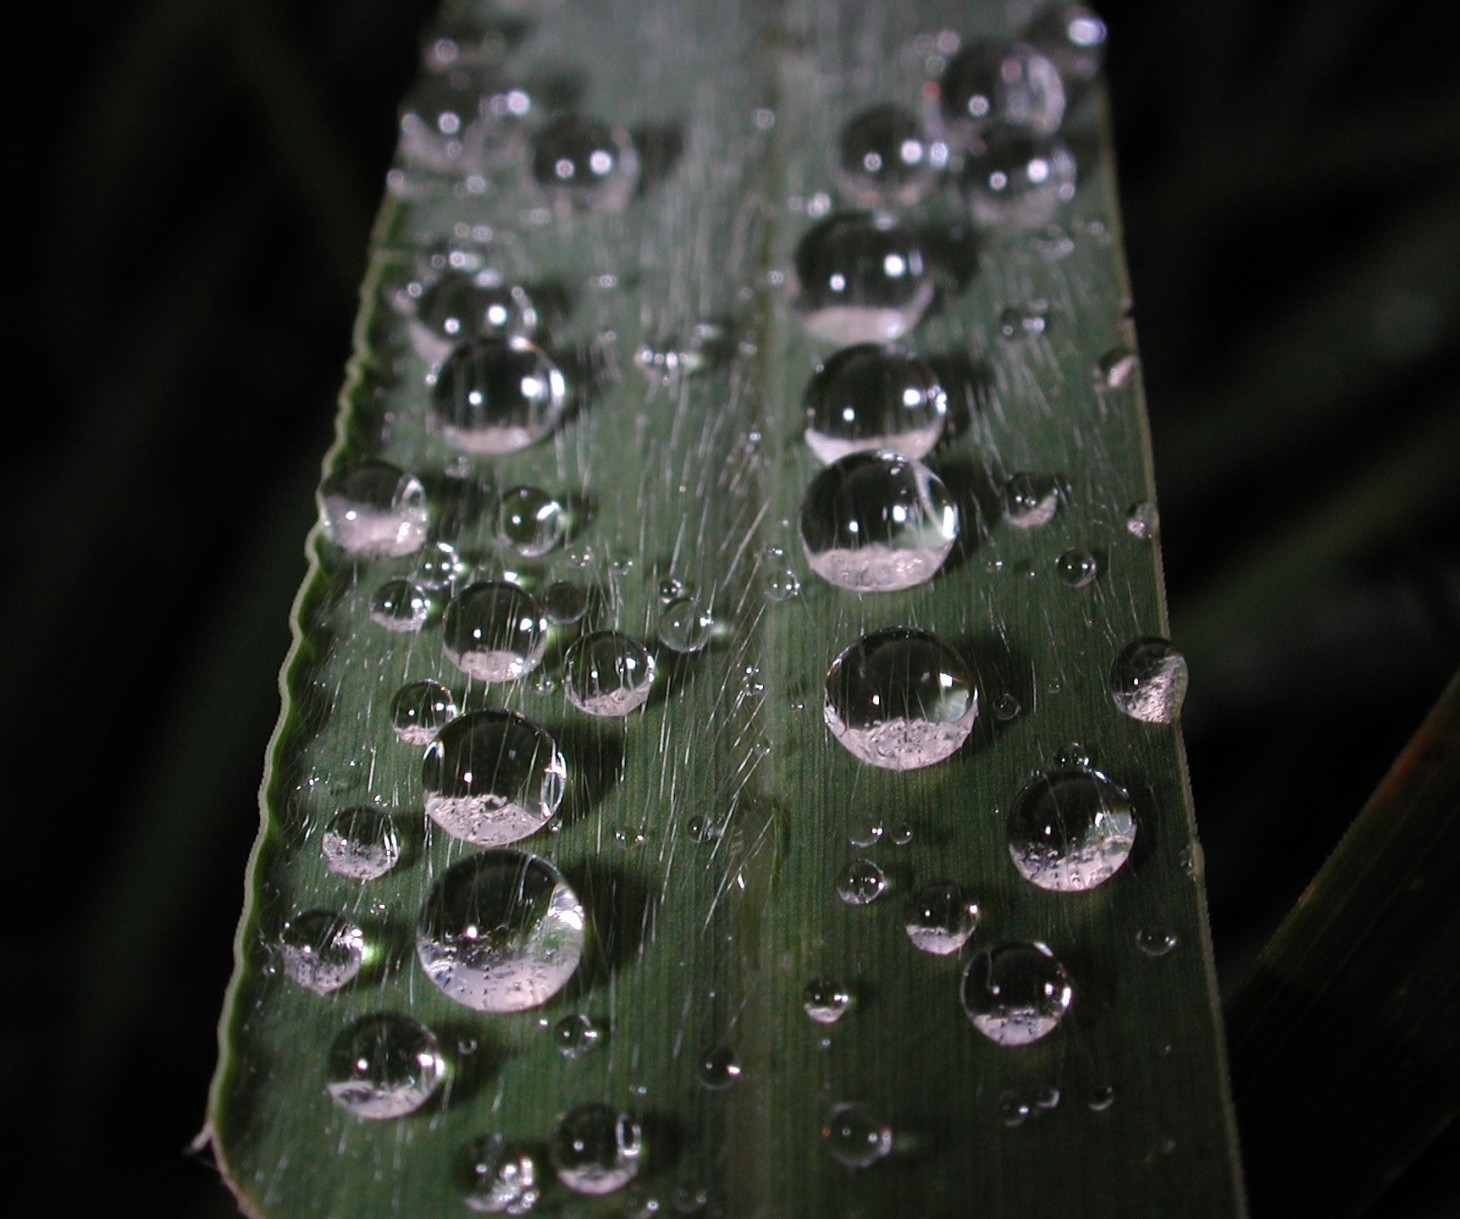 Leaf of Grass byThomas Peace 2012